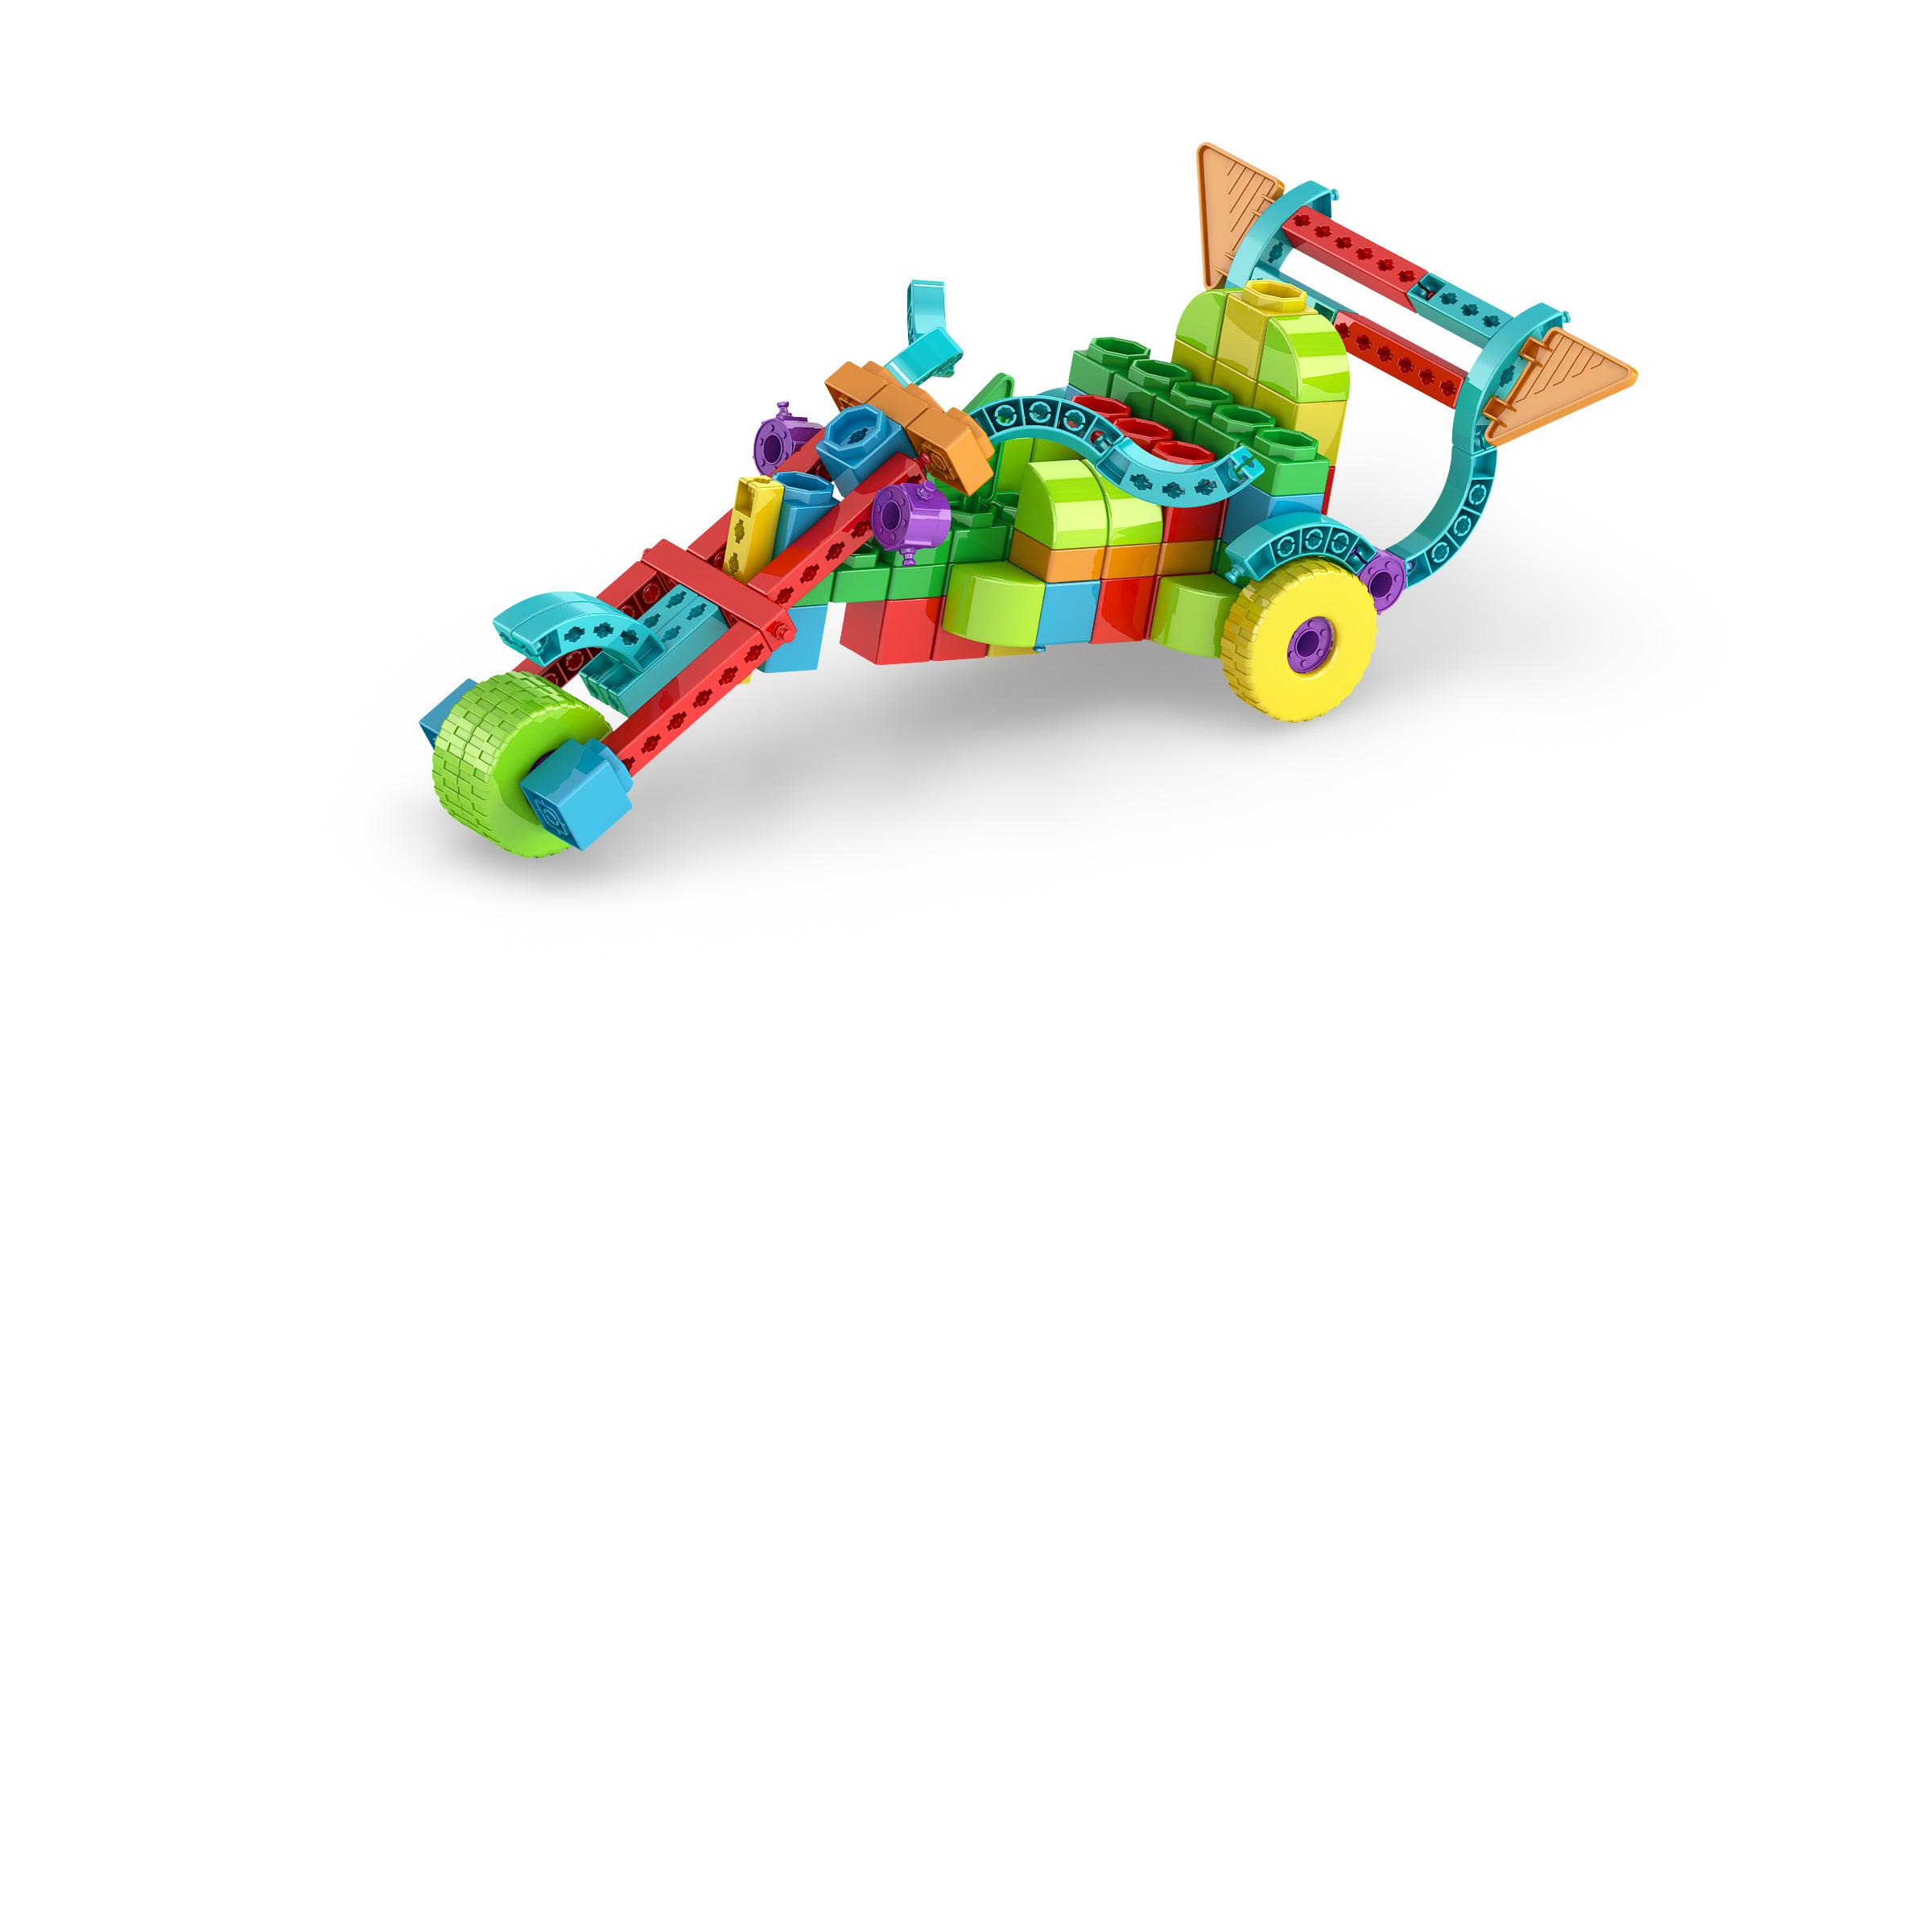 , ThreeWheeler 1, משחקי חשיבה לילדים engino, משחקים לגיל הרך playgro, משחק הרכבות אנג'ינו, משחקי רכבות